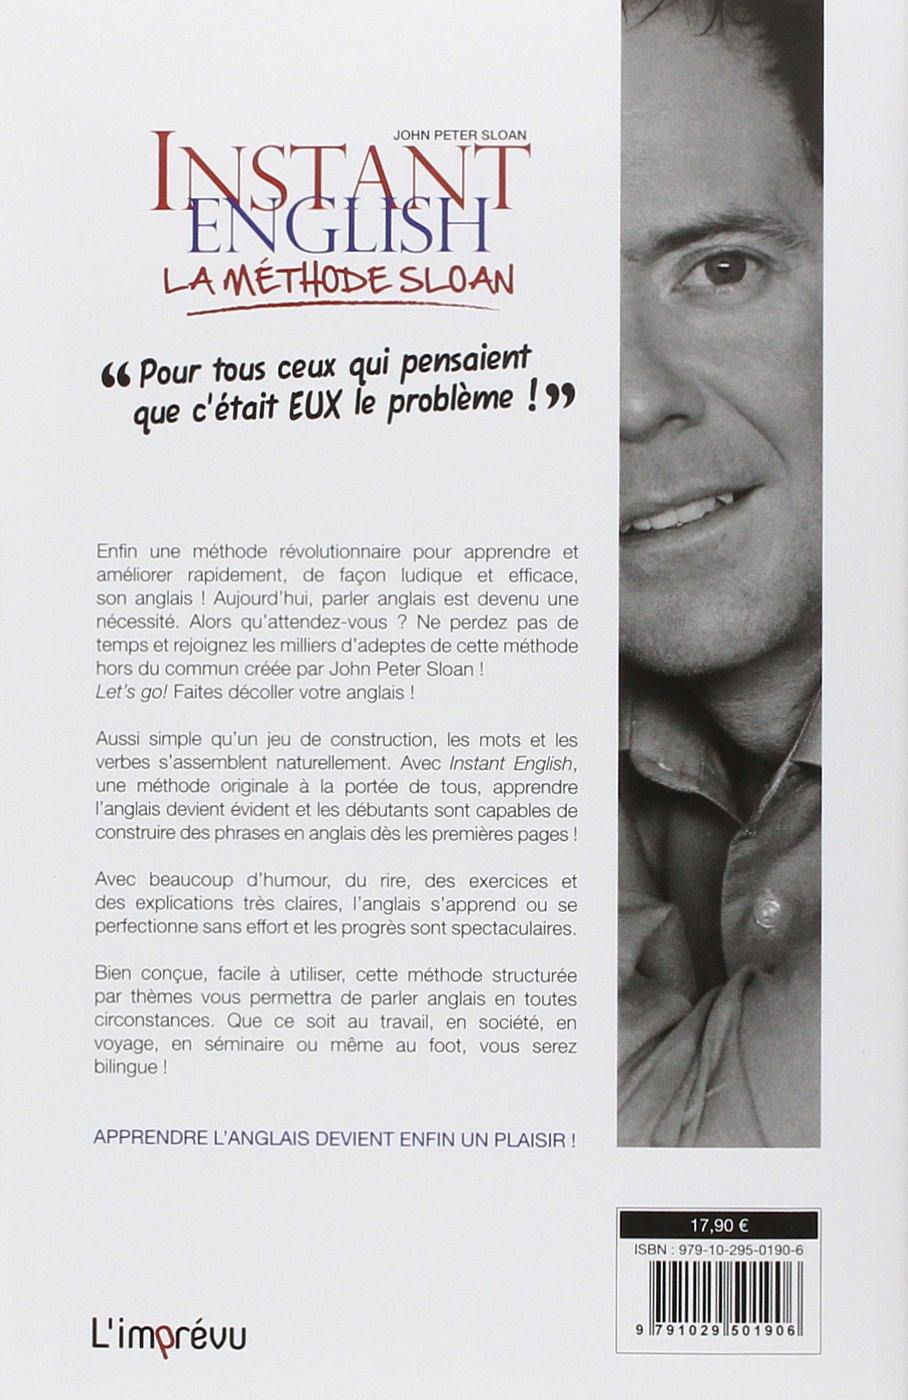 Amazon Fr Instant English La Methode Sloan Sloan John Peter Campa Cosimo Delmotte Axel Livres